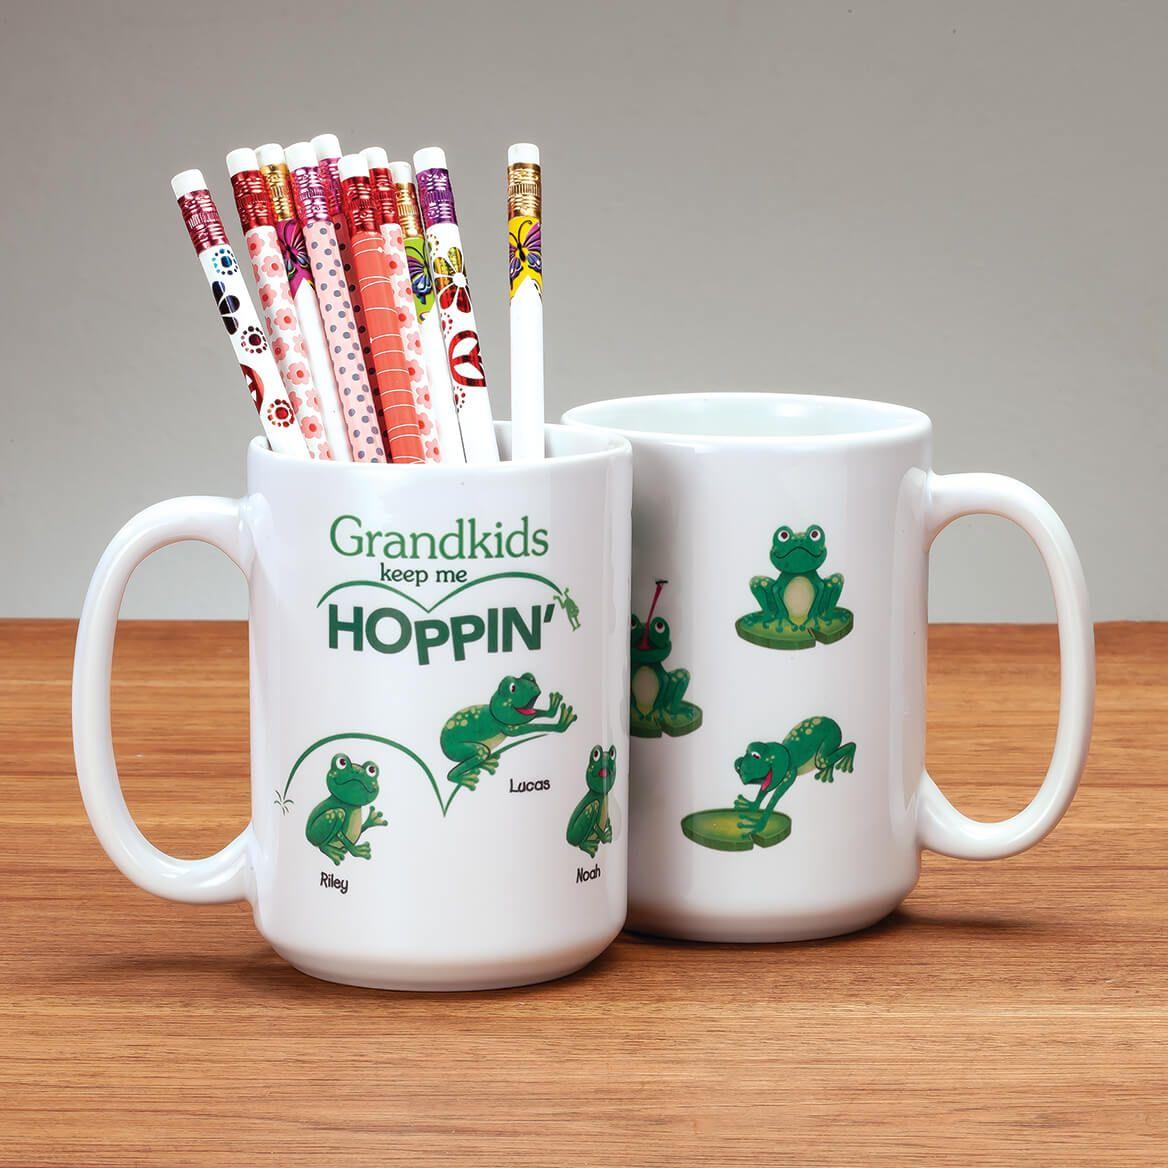 Personalized Grandkids Keep Me Hoppin' Mug-369378